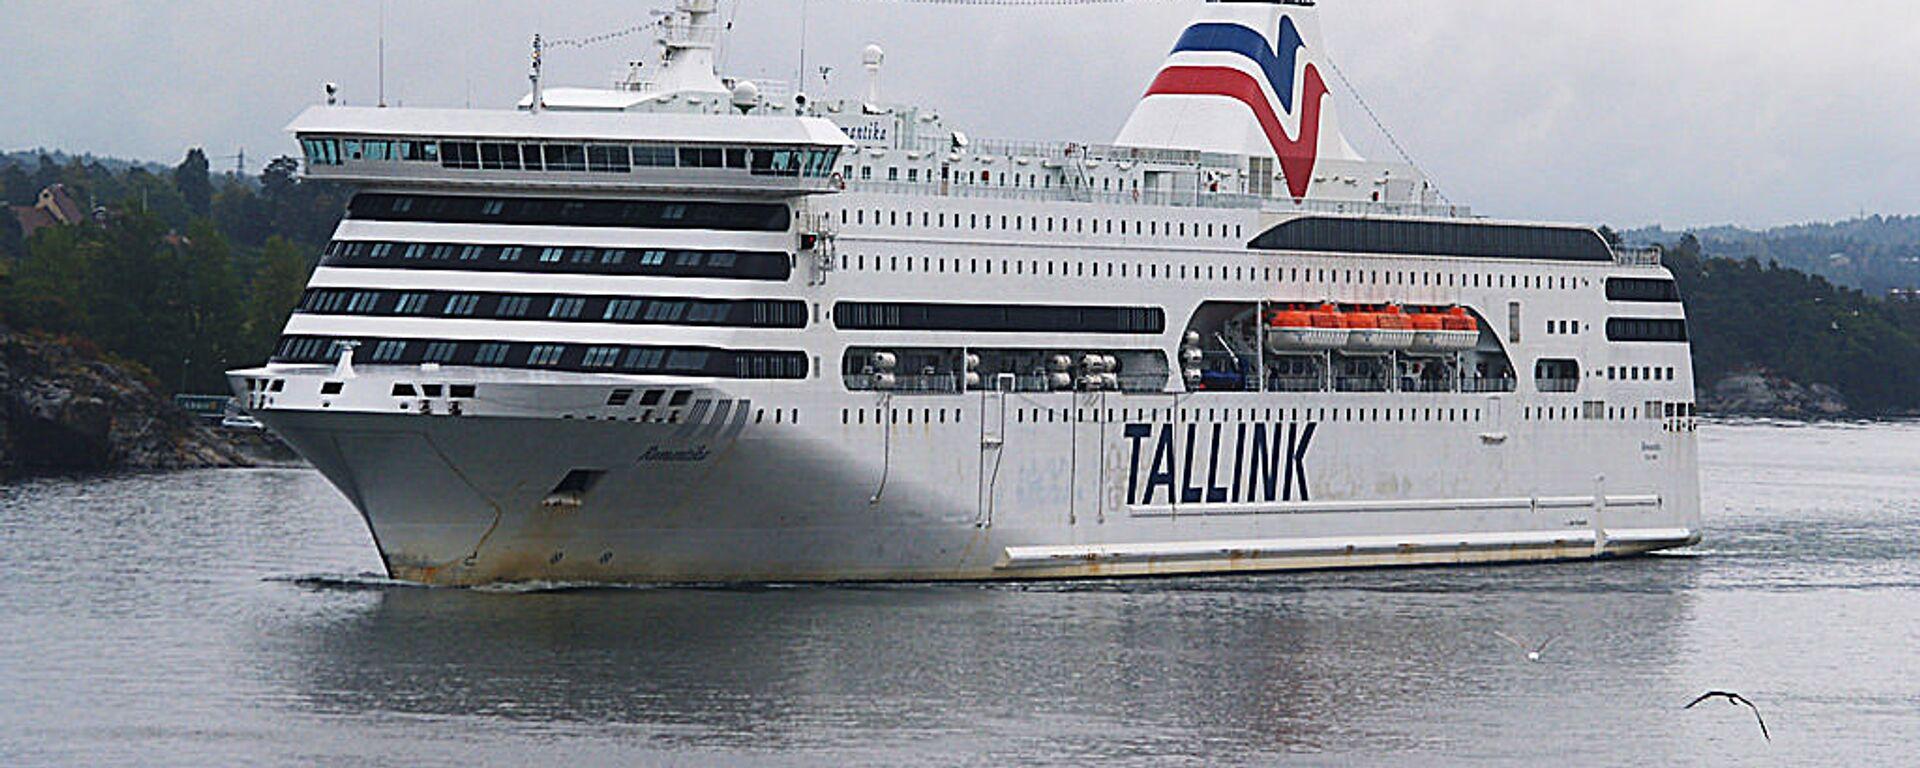 Пассажирский лайнер Таллинк  - Sputnik Латвия, 1920, 01.06.2021